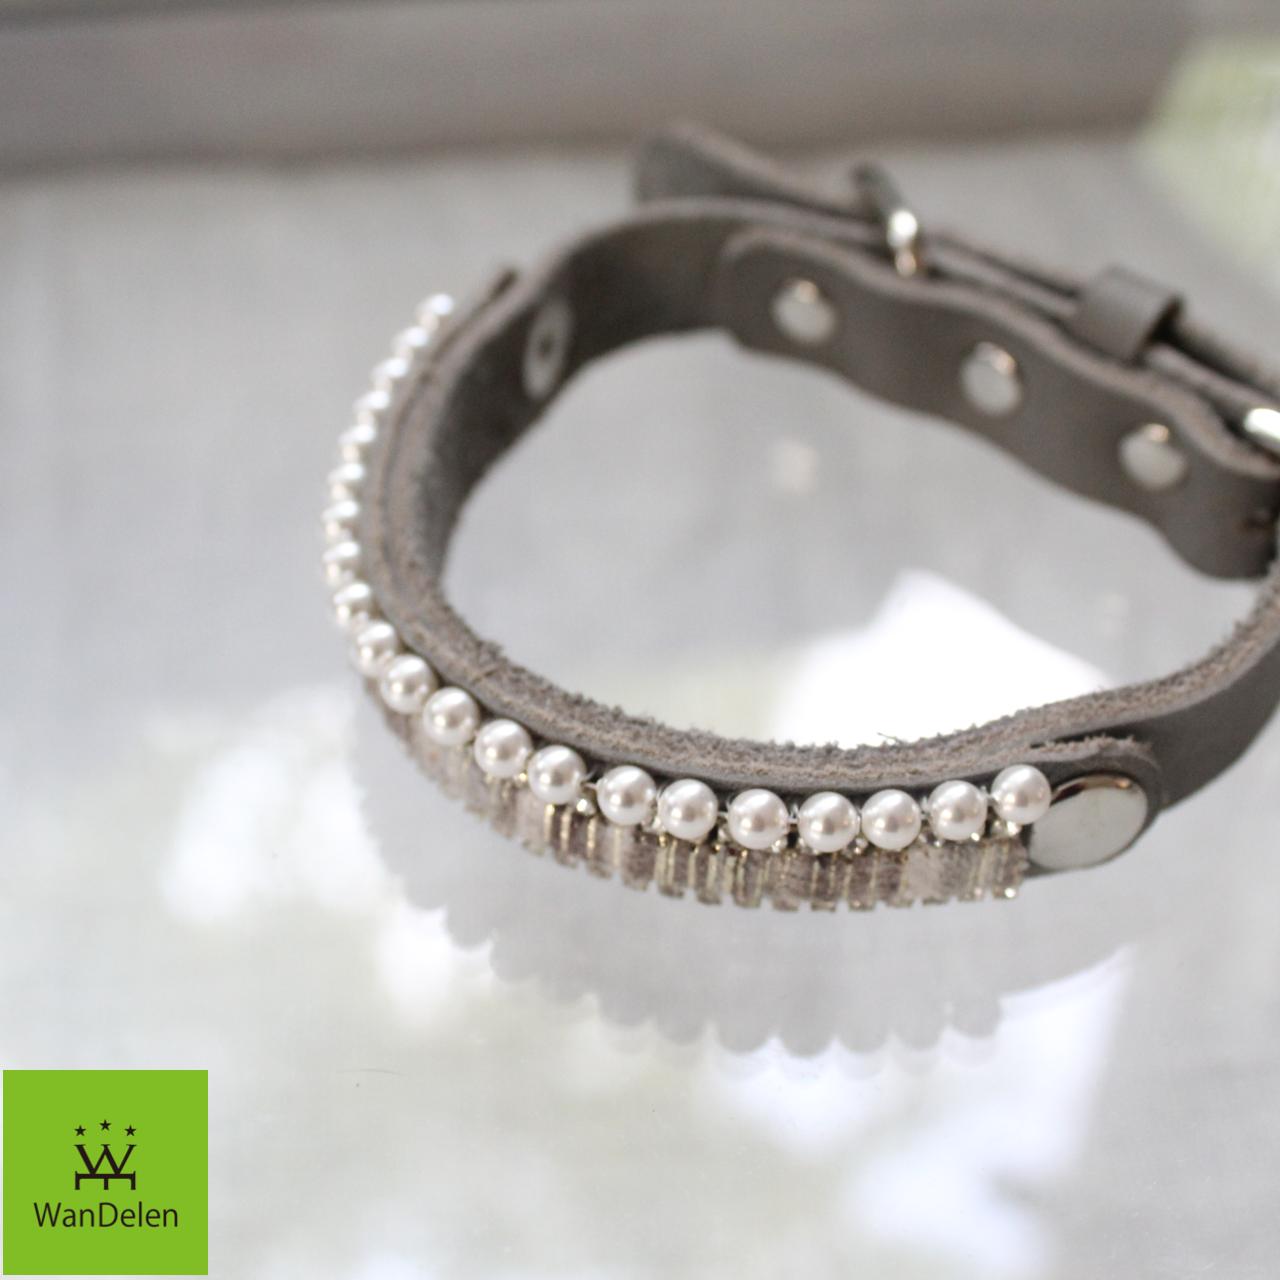 """ WanDelen"" Dog Necklace (stripe grey)"